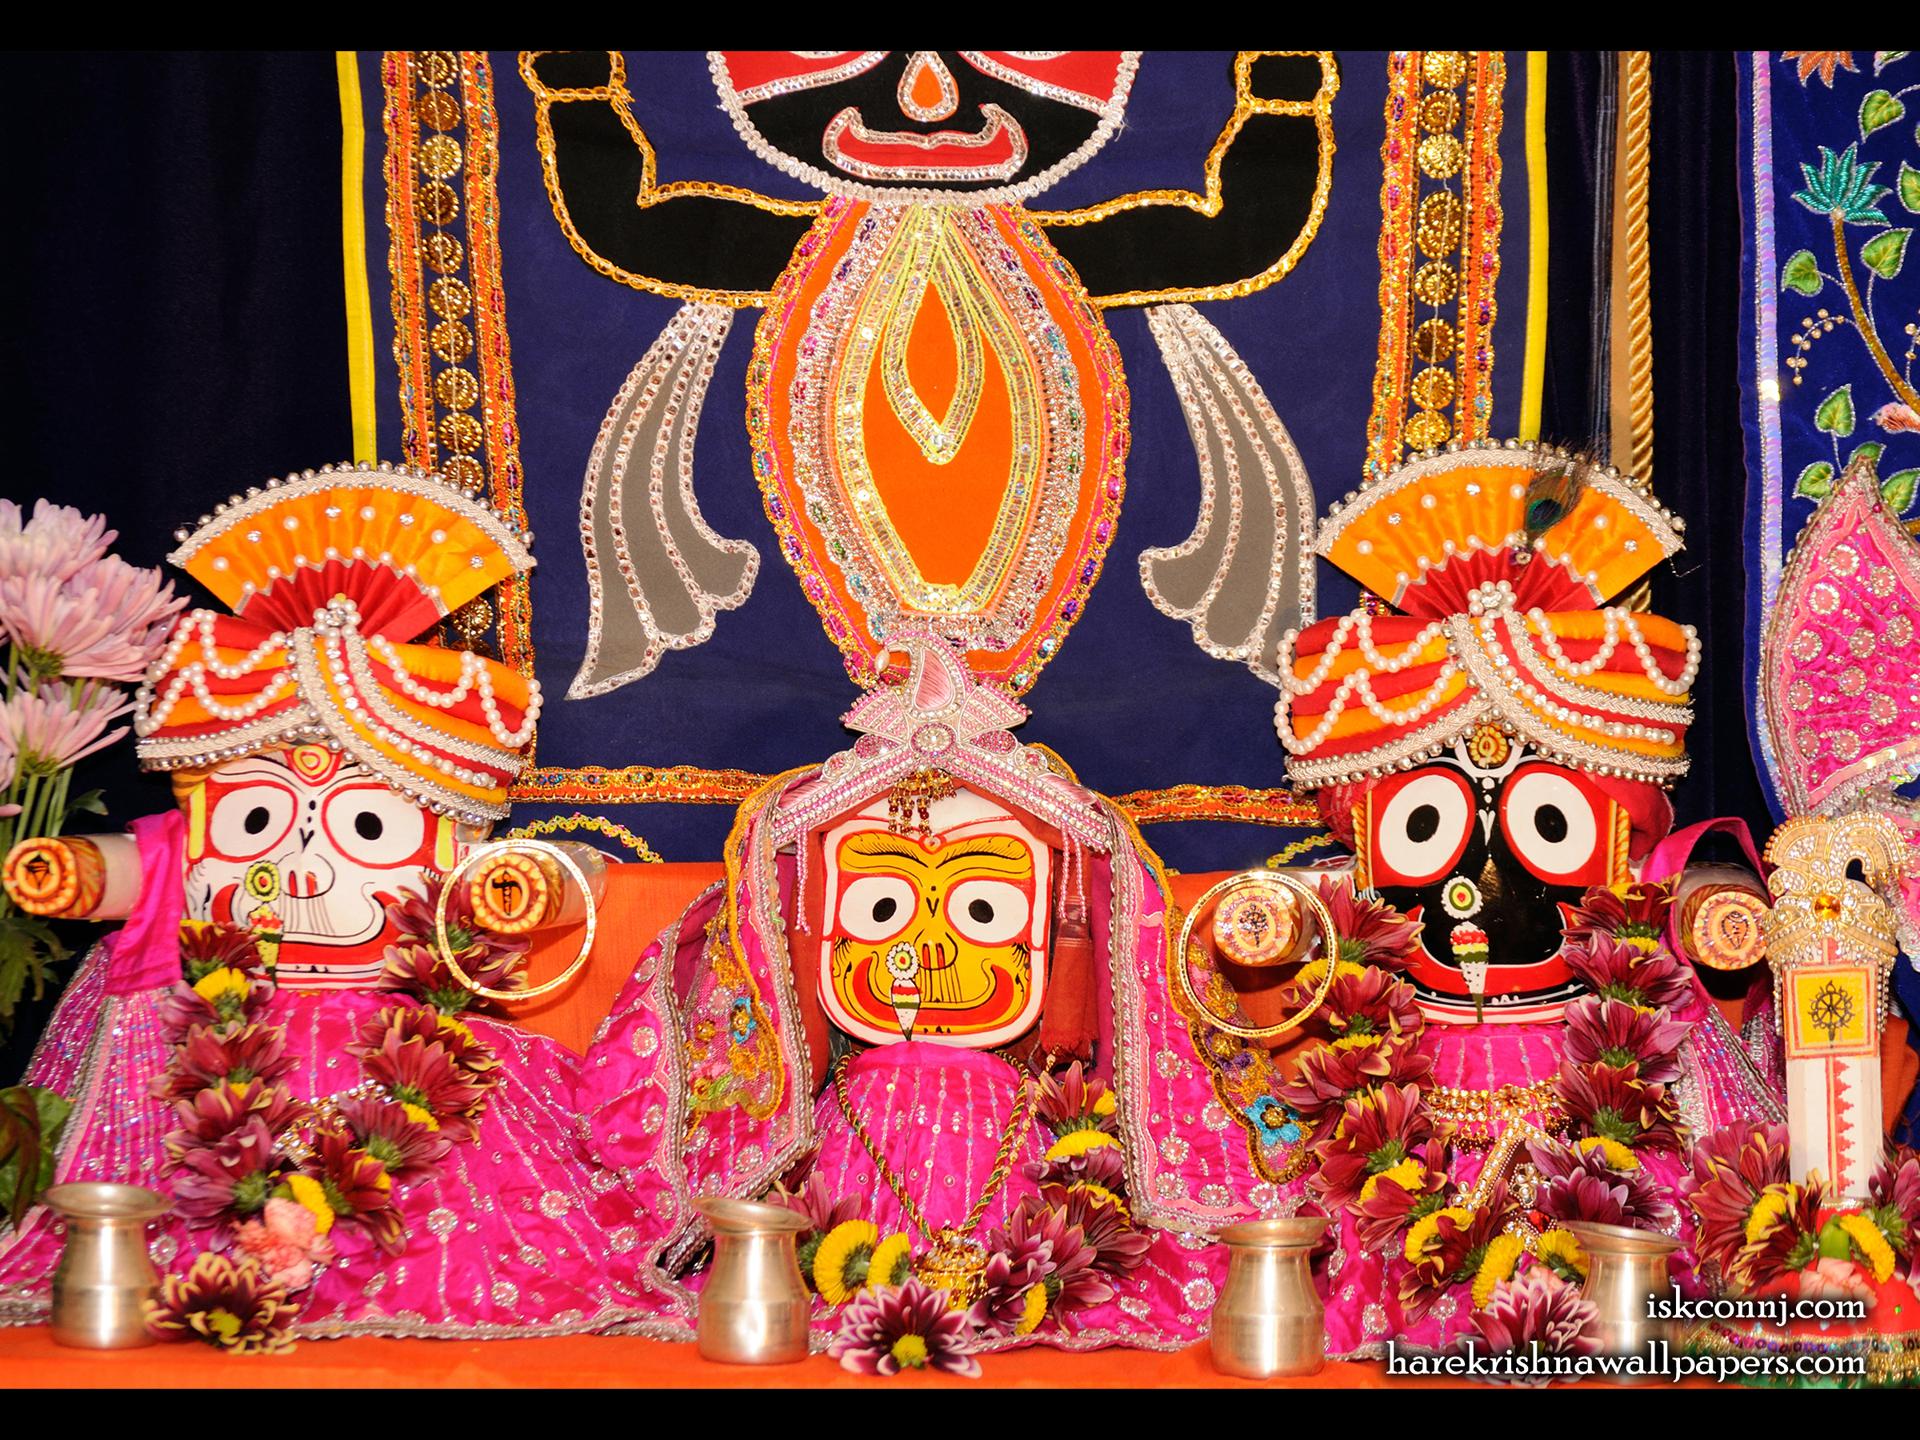 Jagannath Baladeva Subhadra Wallpaper (007) Size 1920x1440 Download